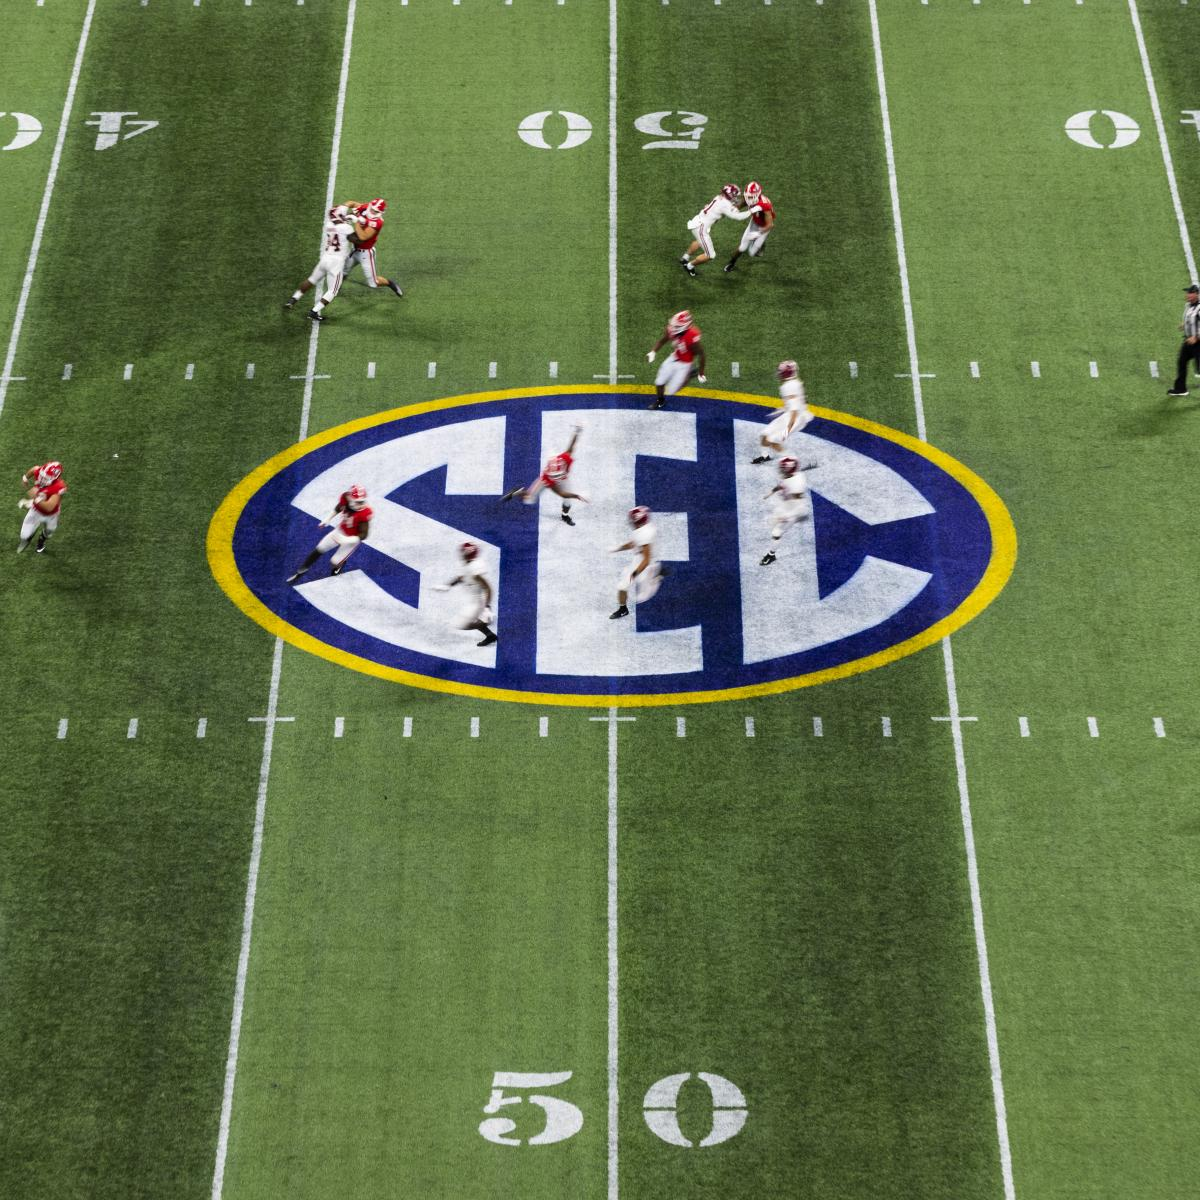 SEC Announces 10-Game 2020 College Football Schedule